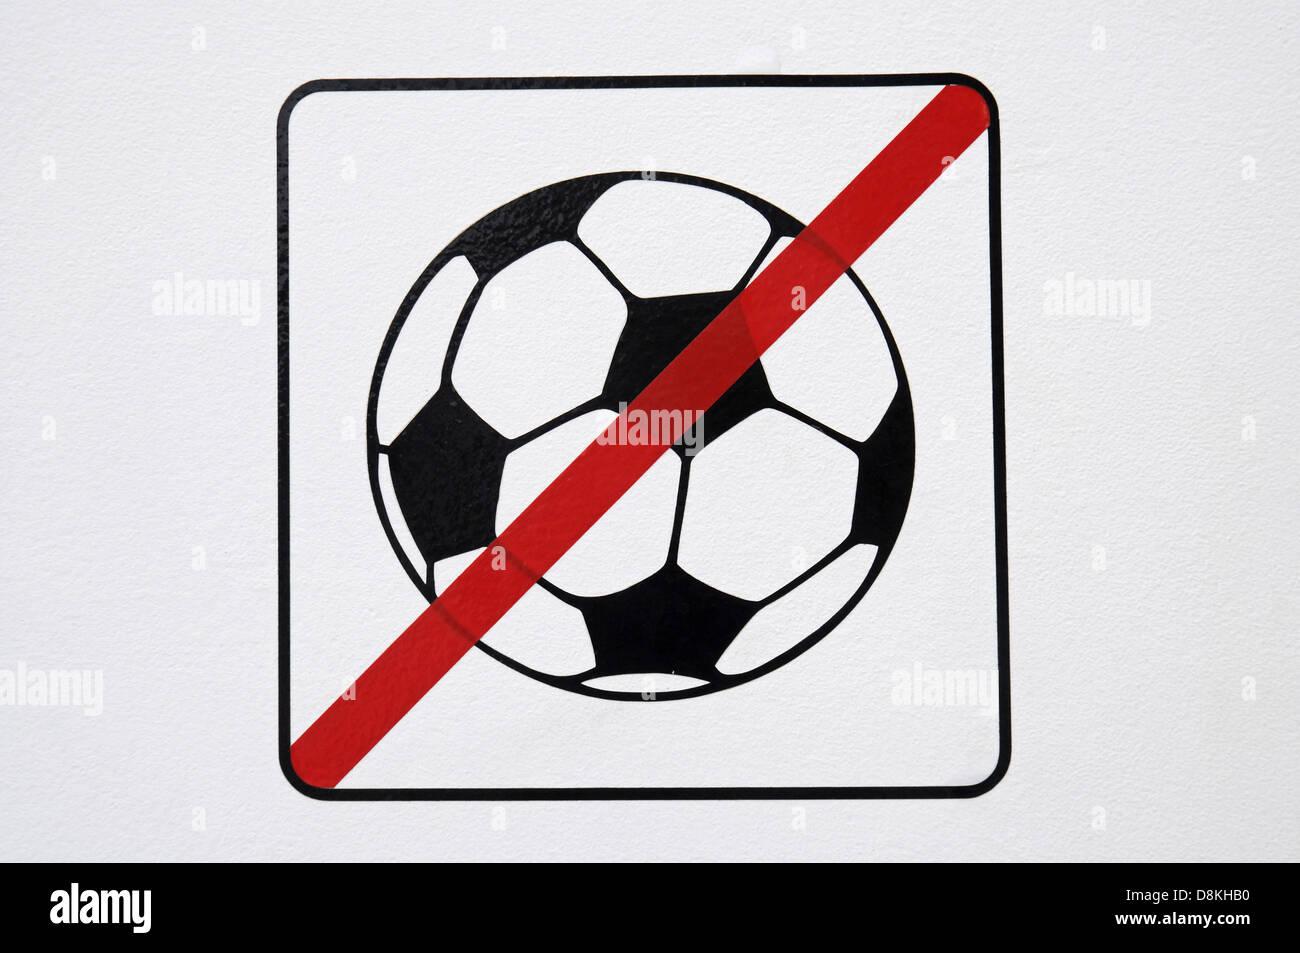 Fussball spielen verboten Stock Photo